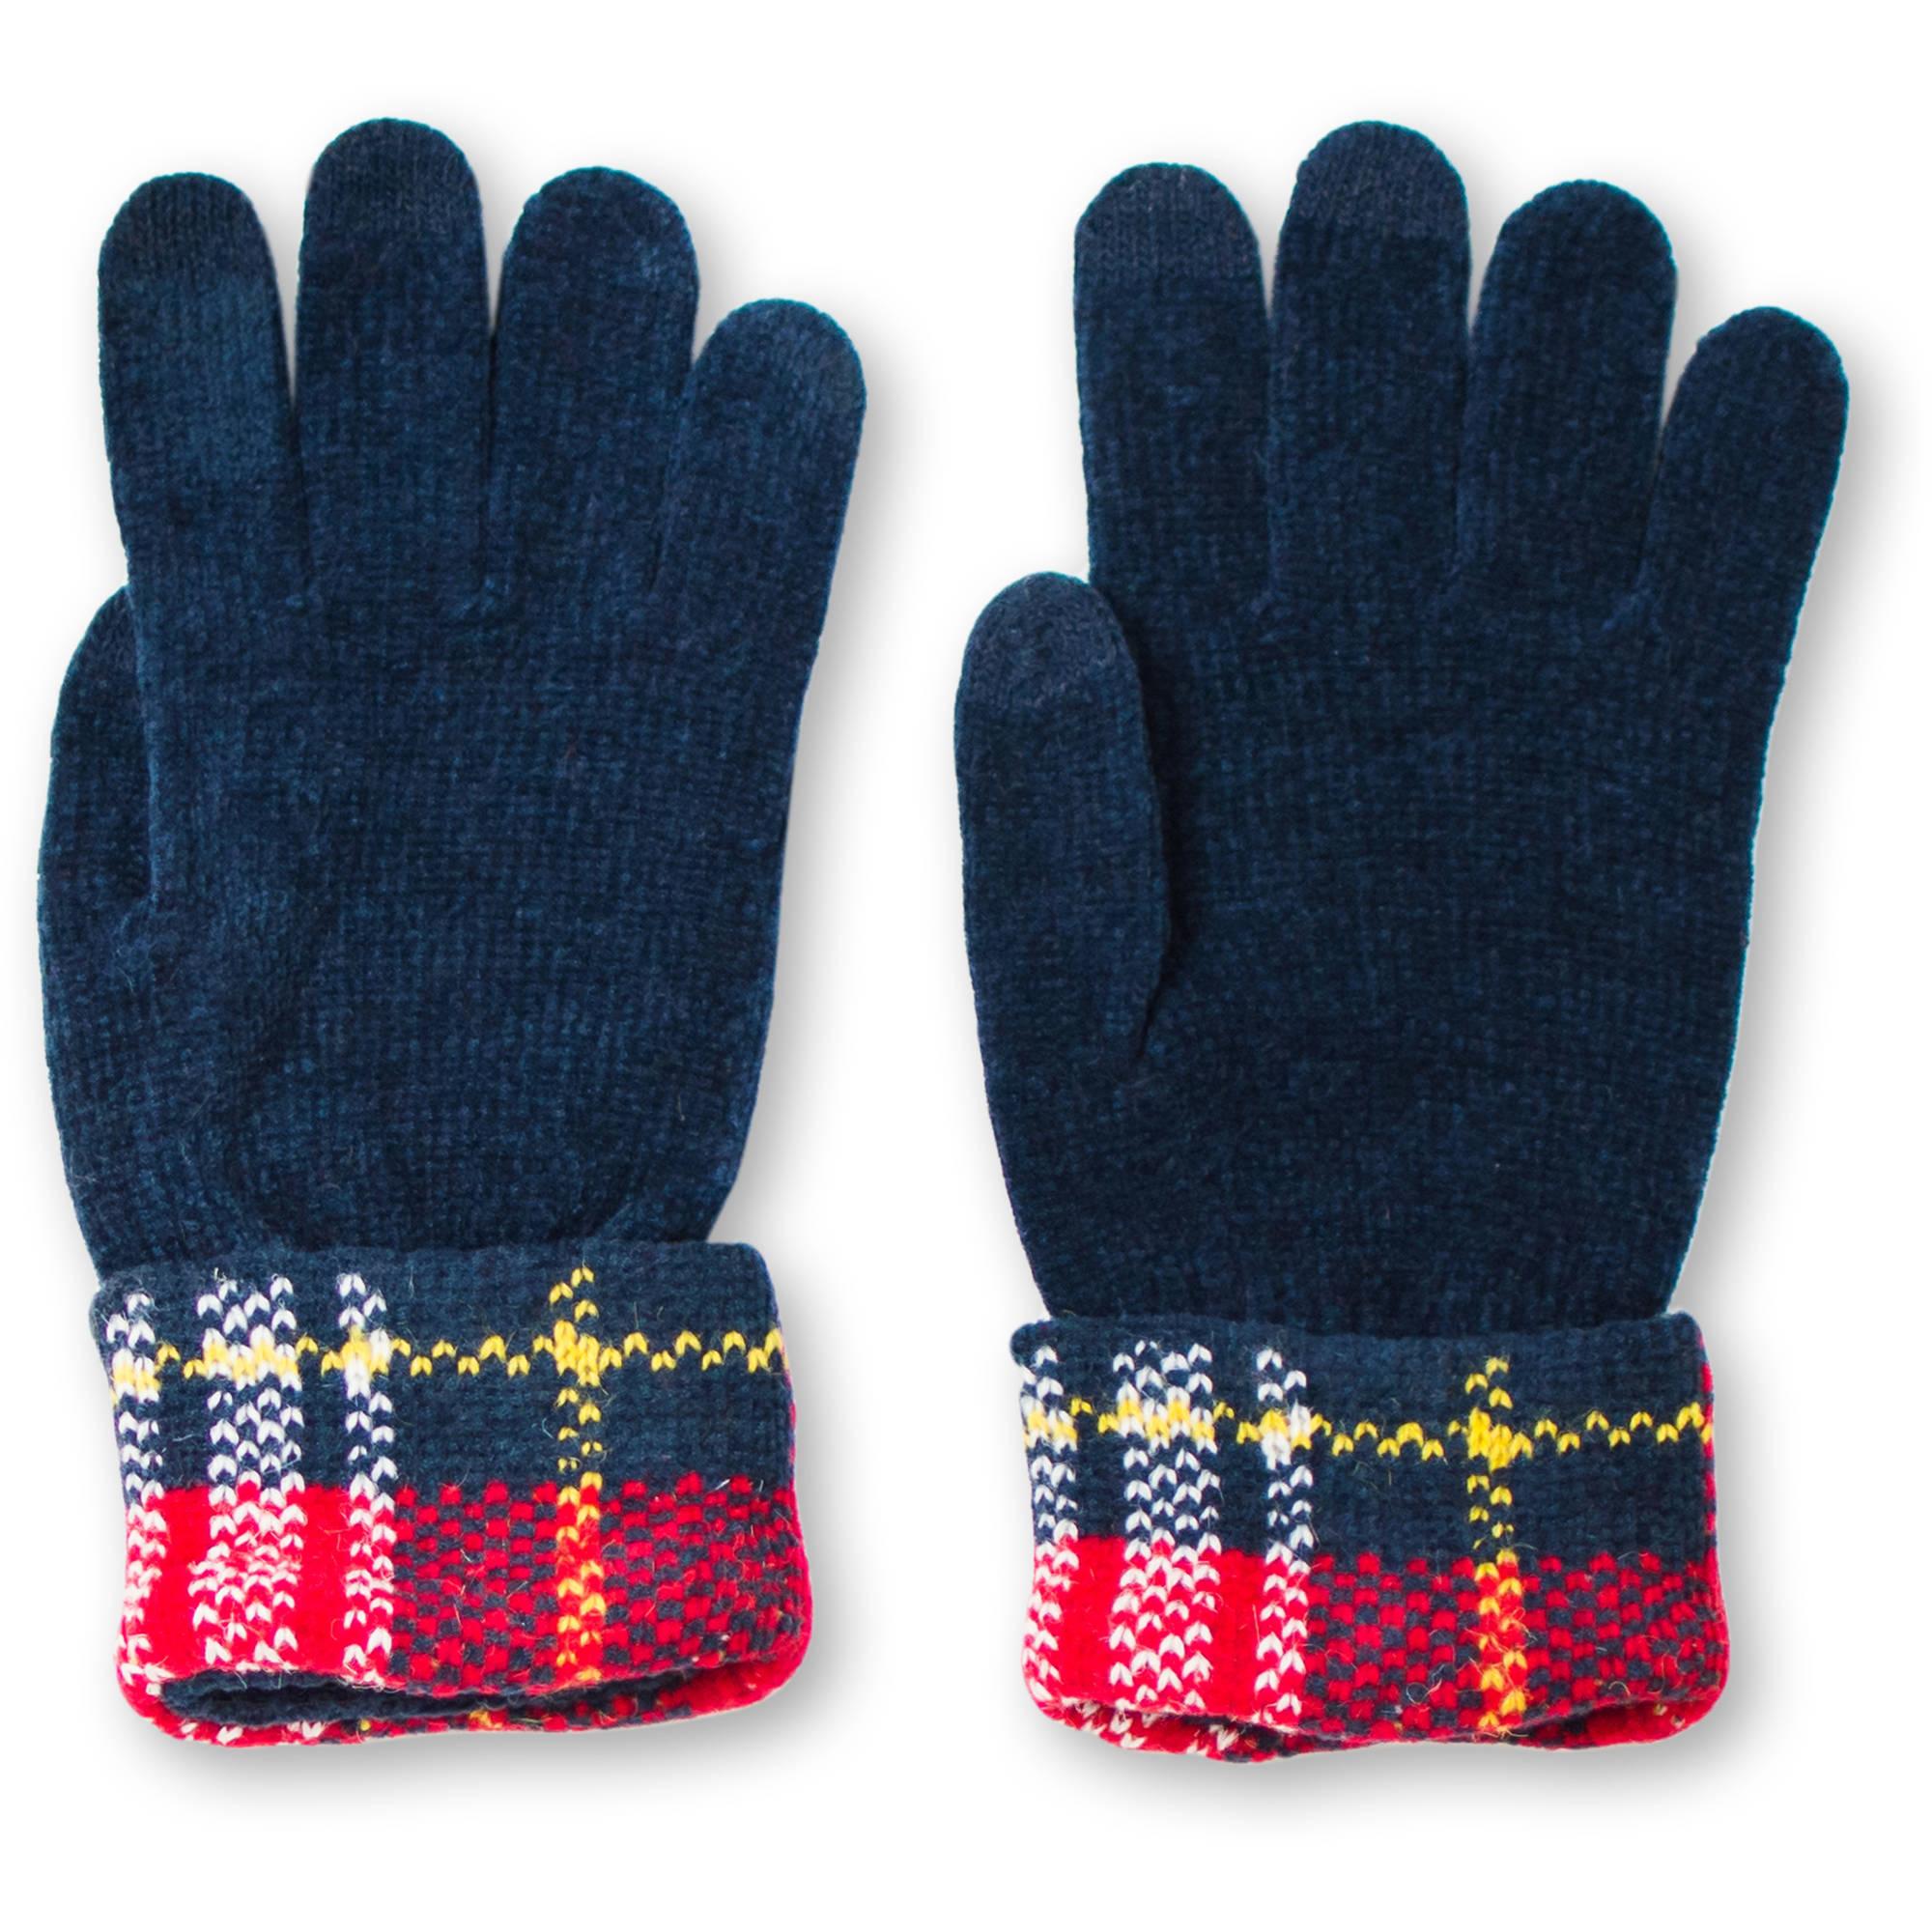 Faded Glory Women's Chenille Glove